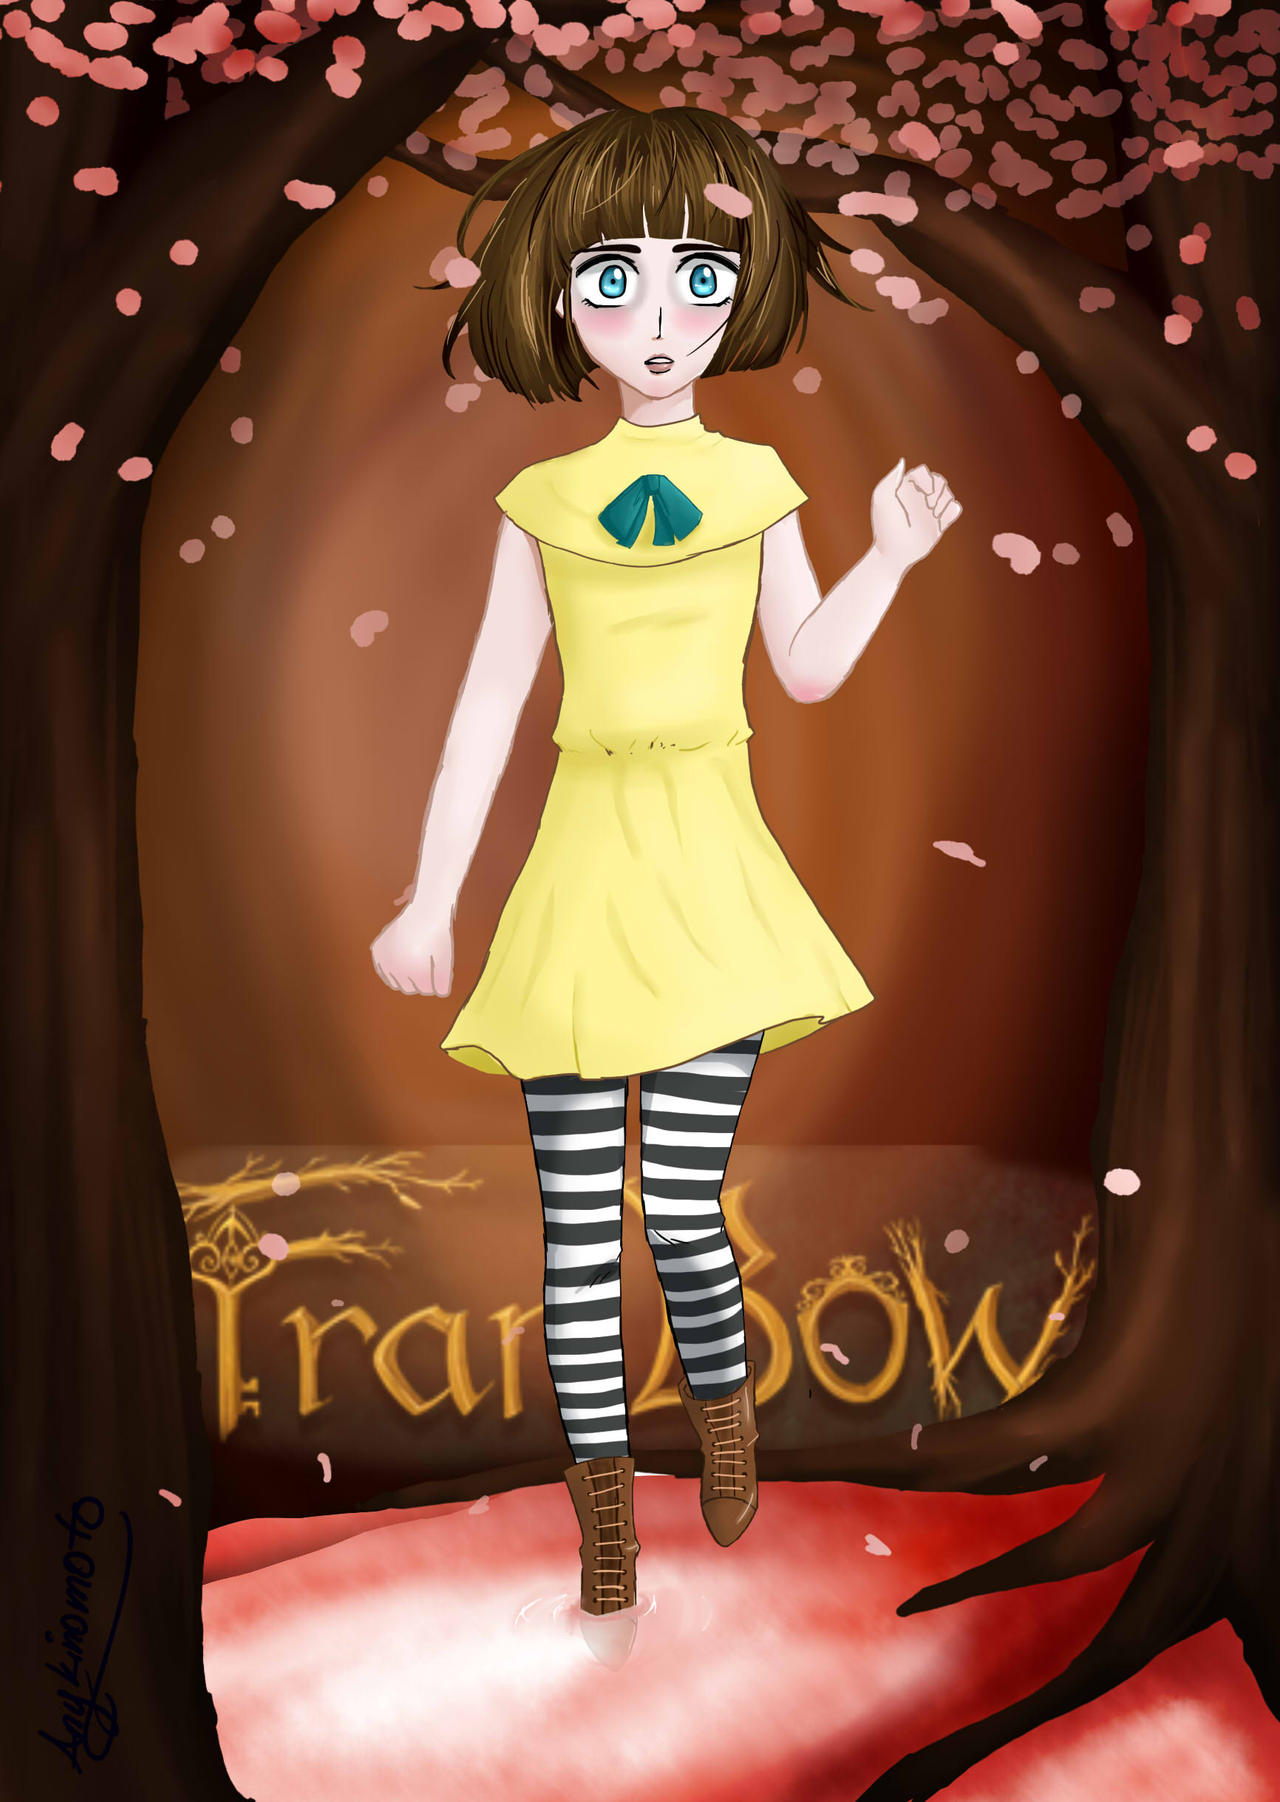 fran_bow_by_anykinomoto-d989klr.jpg